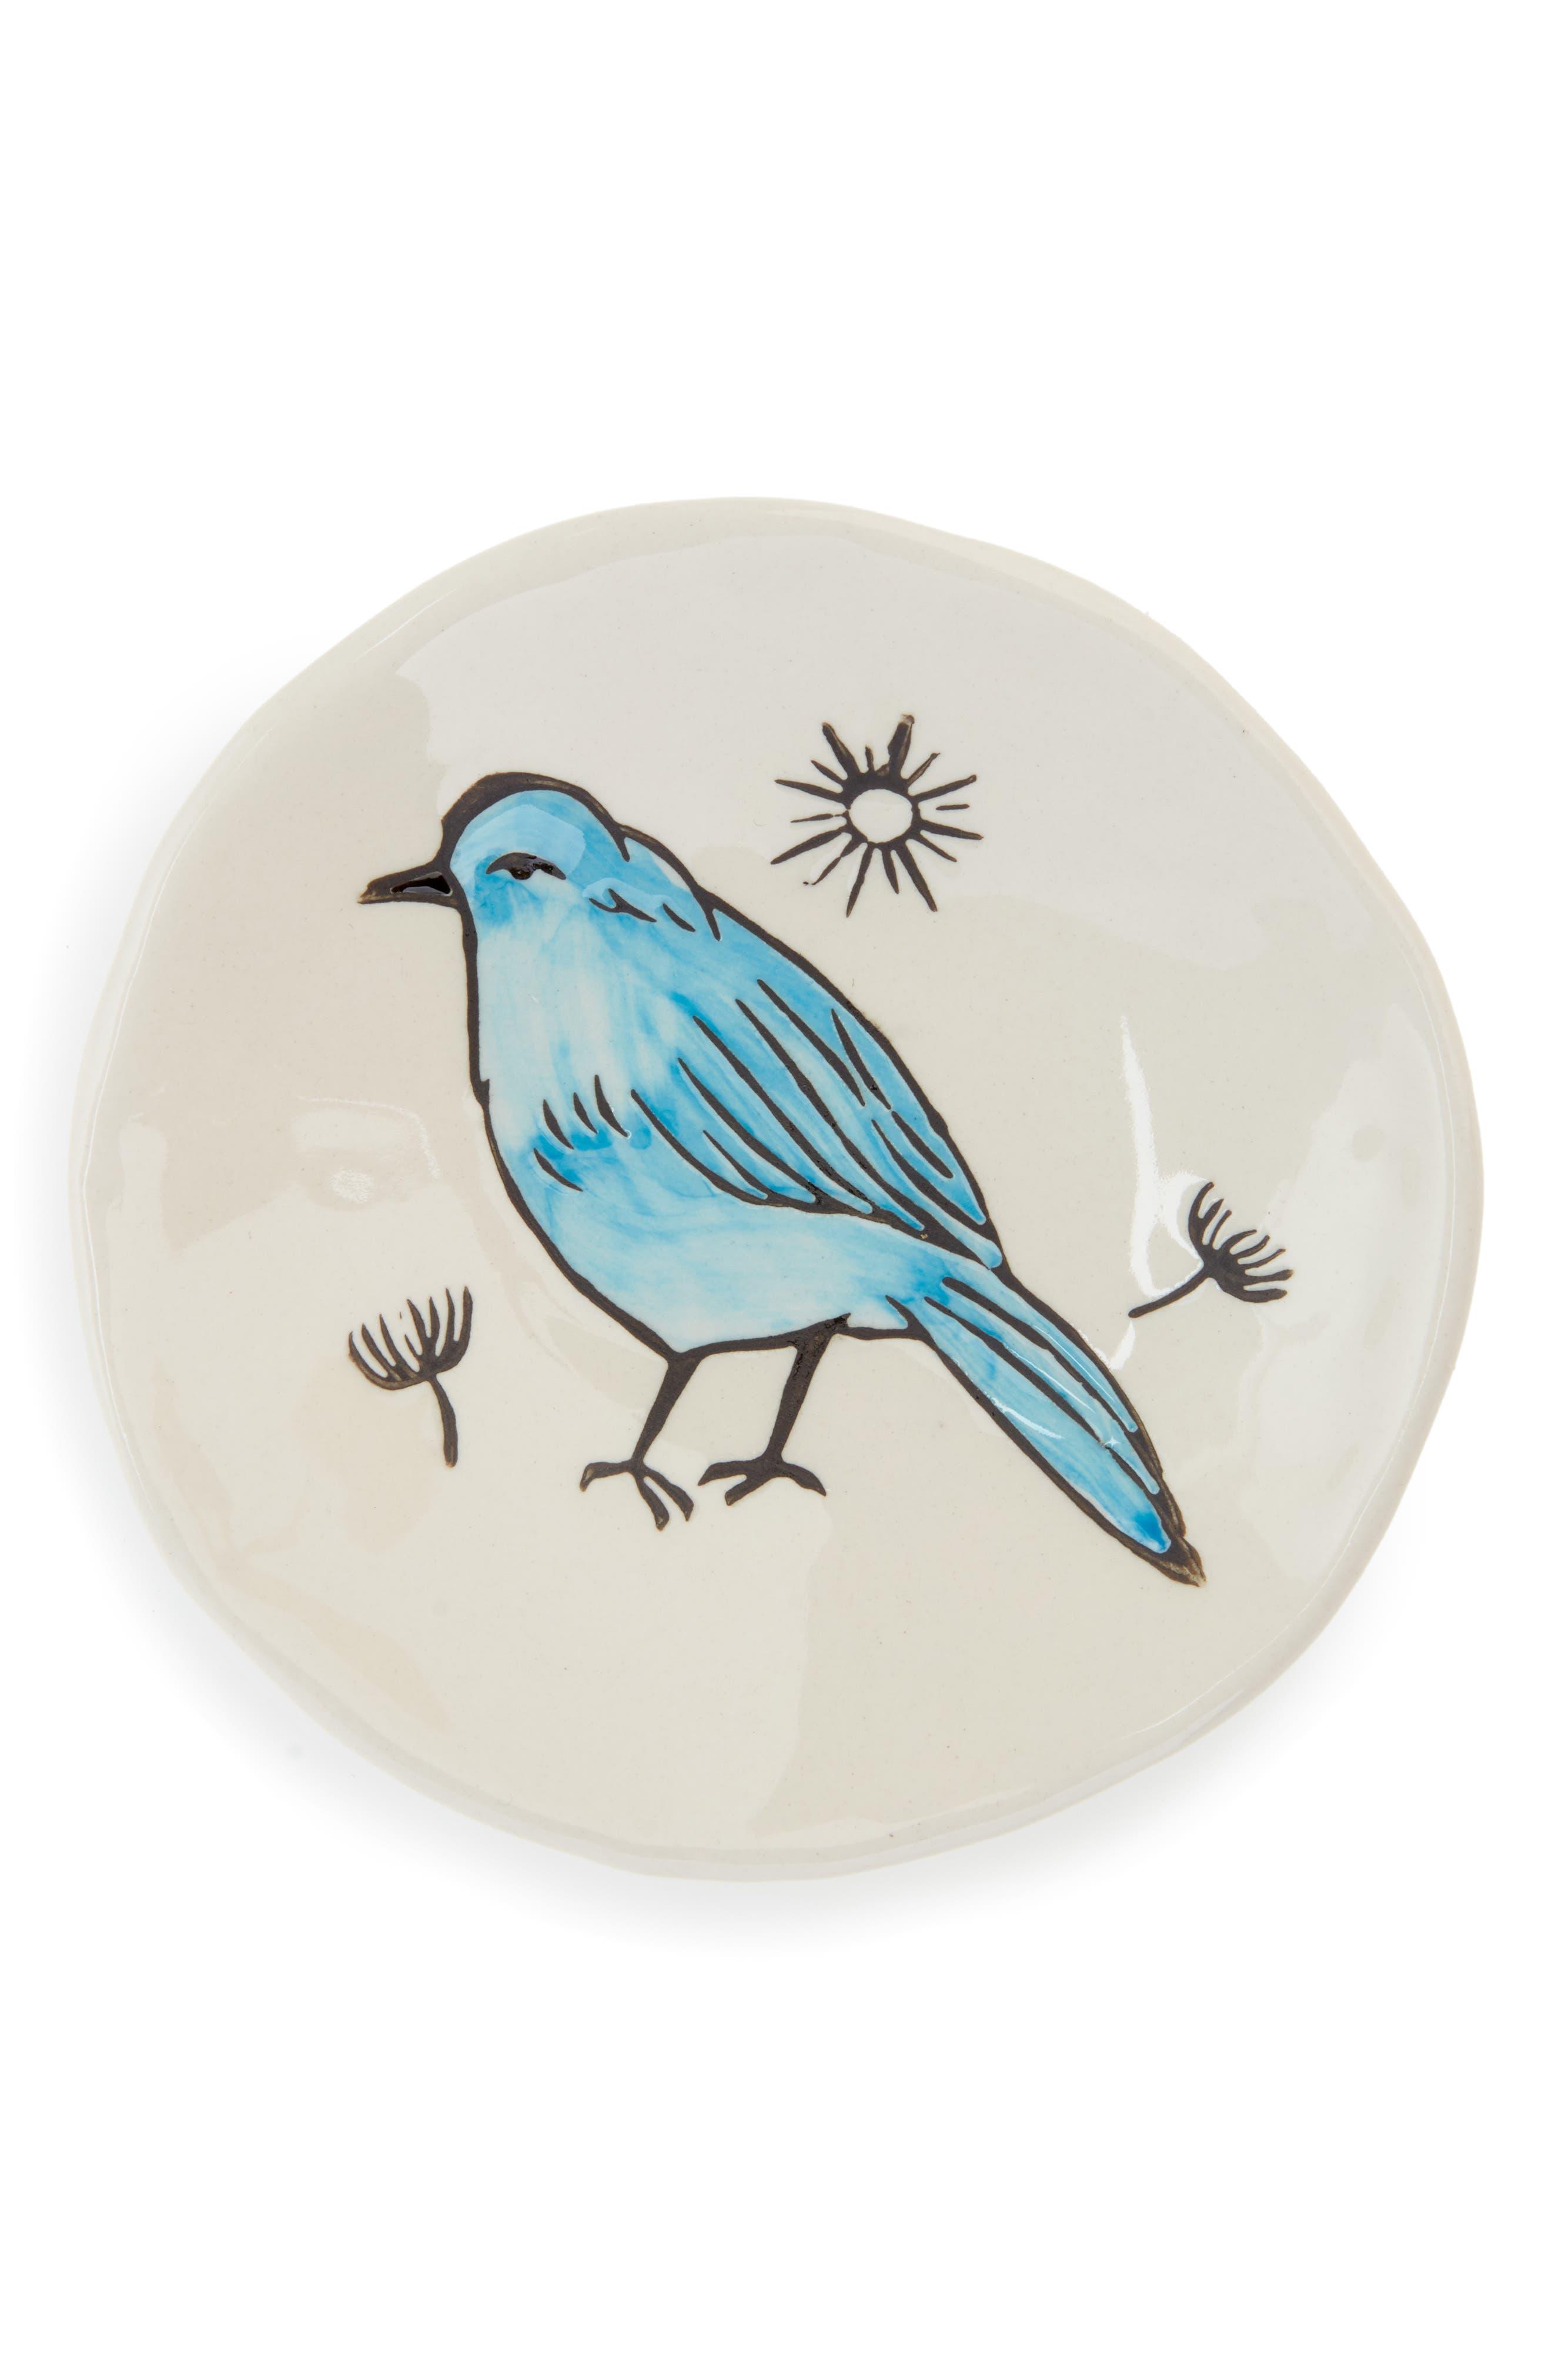 Small Bird Plate,                             Main thumbnail 1, color,                             100